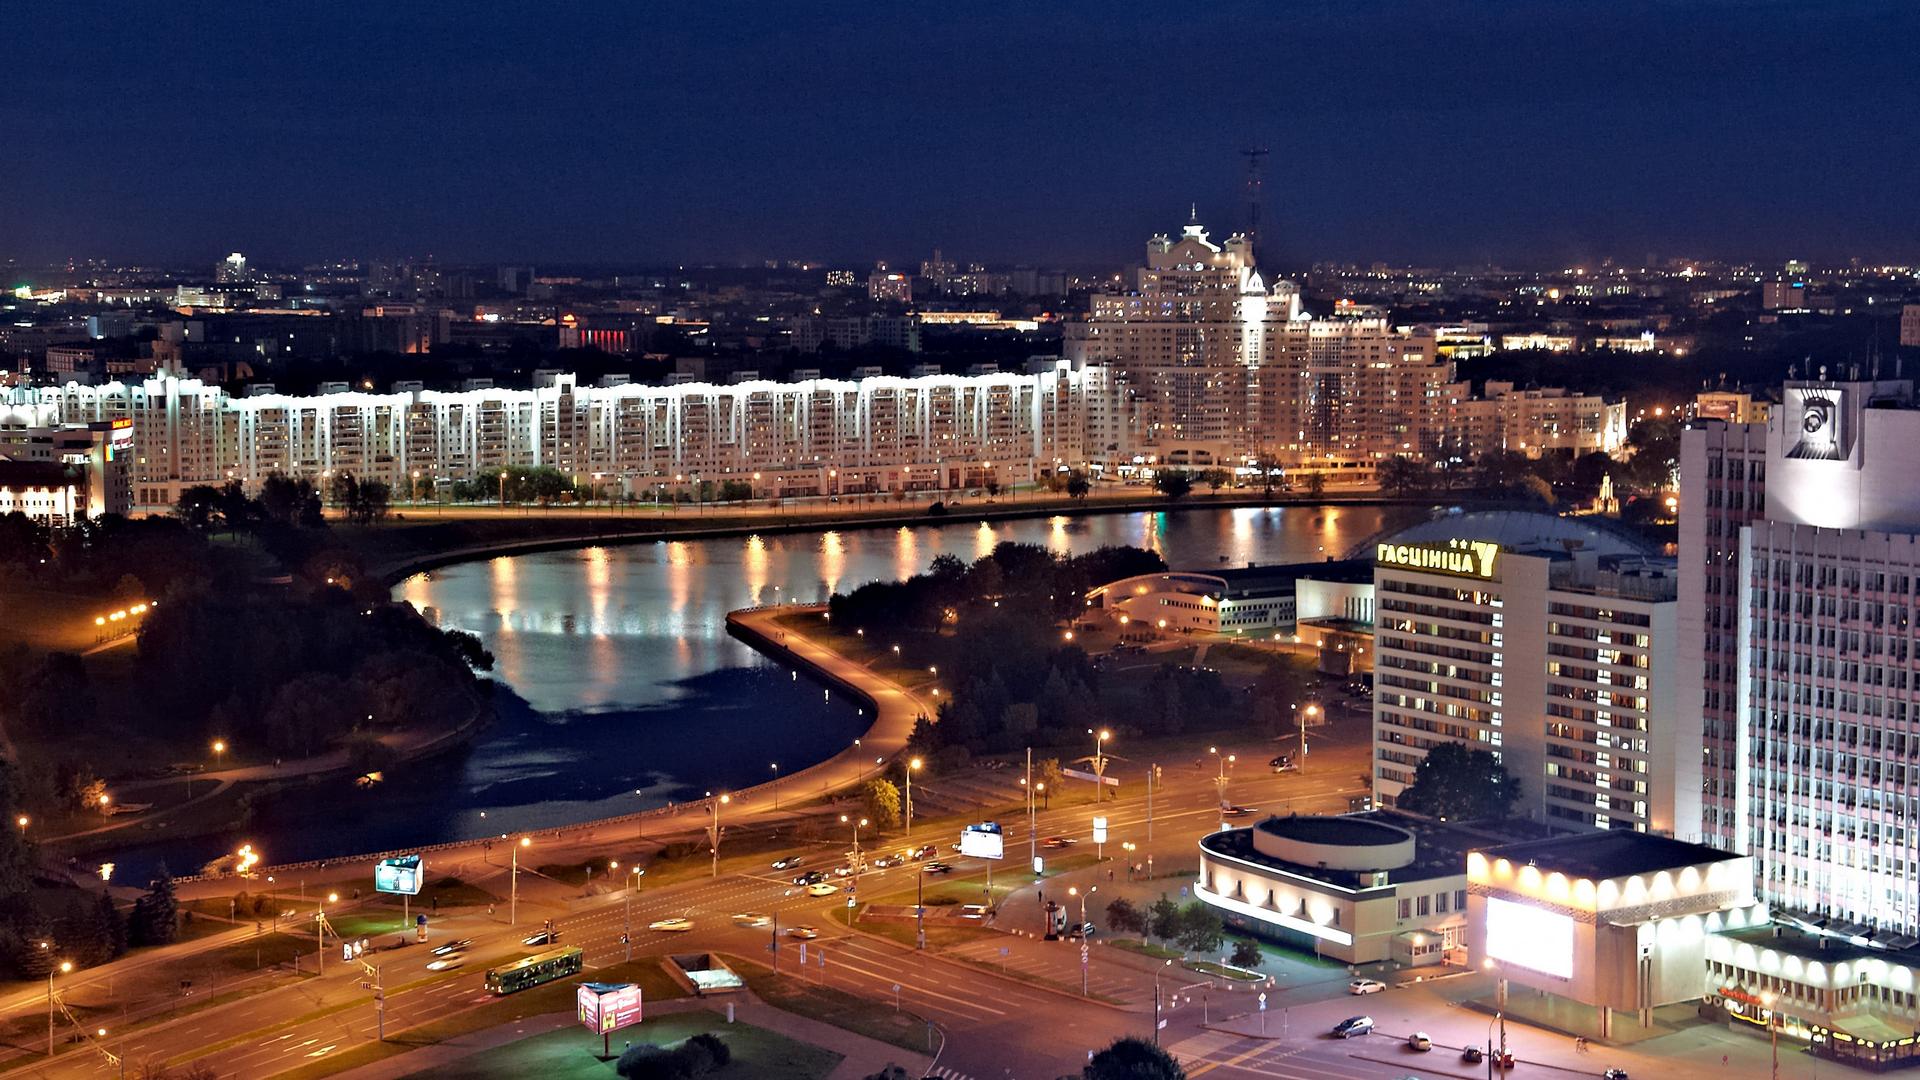 A view in Belarus